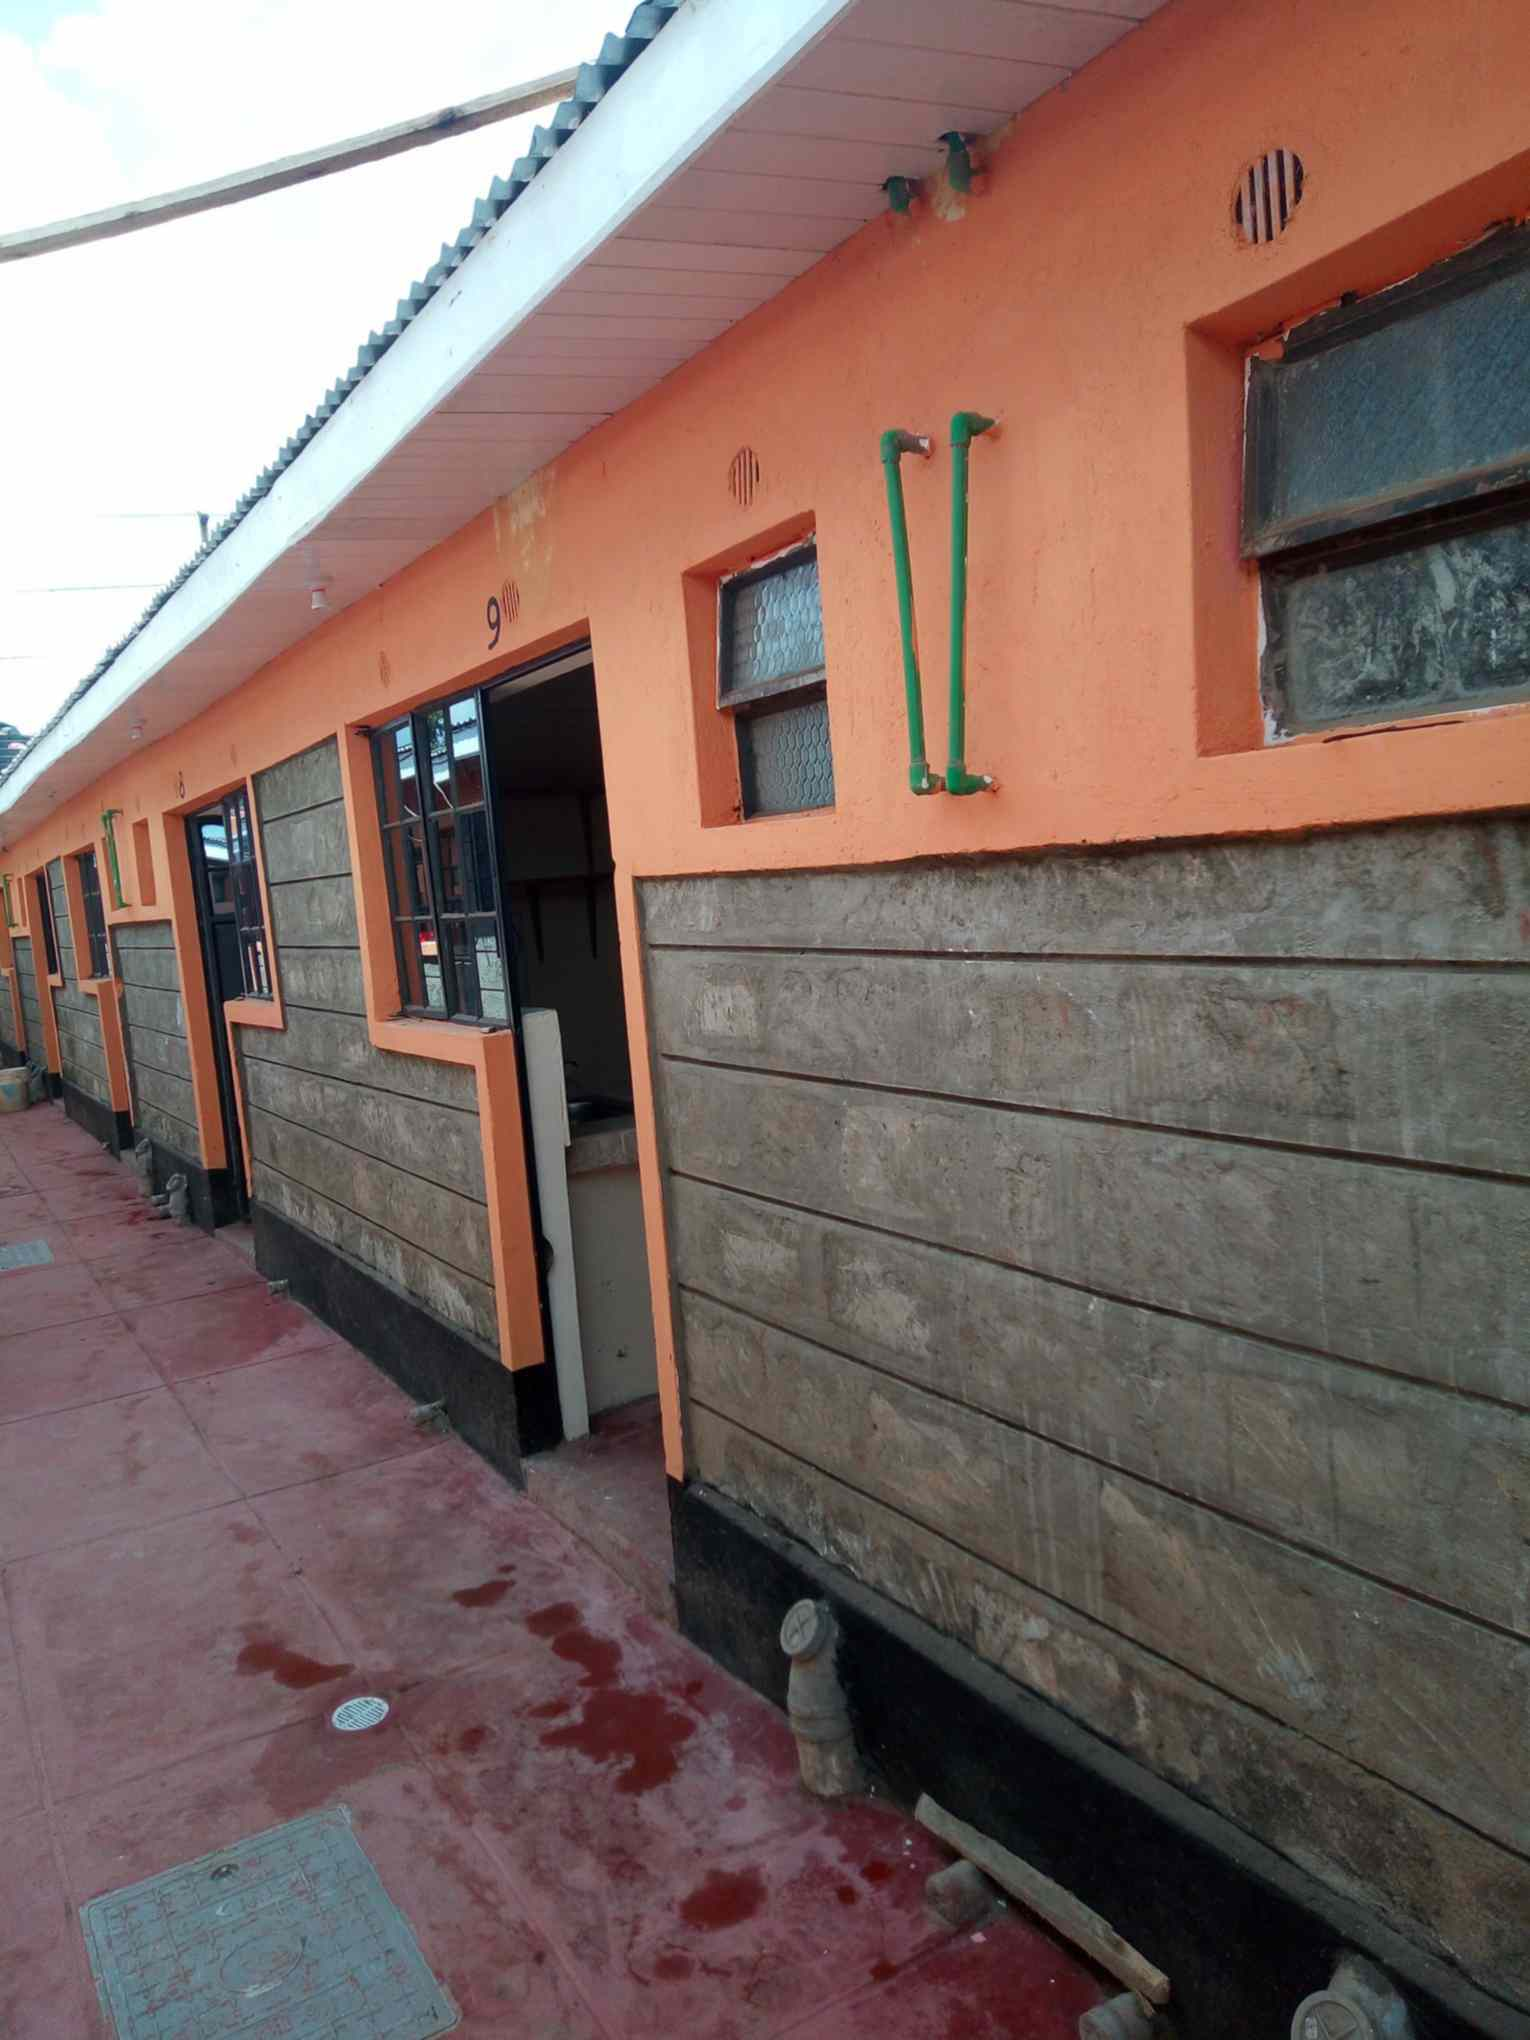 Shop and bedsitter to let along kikuyu road